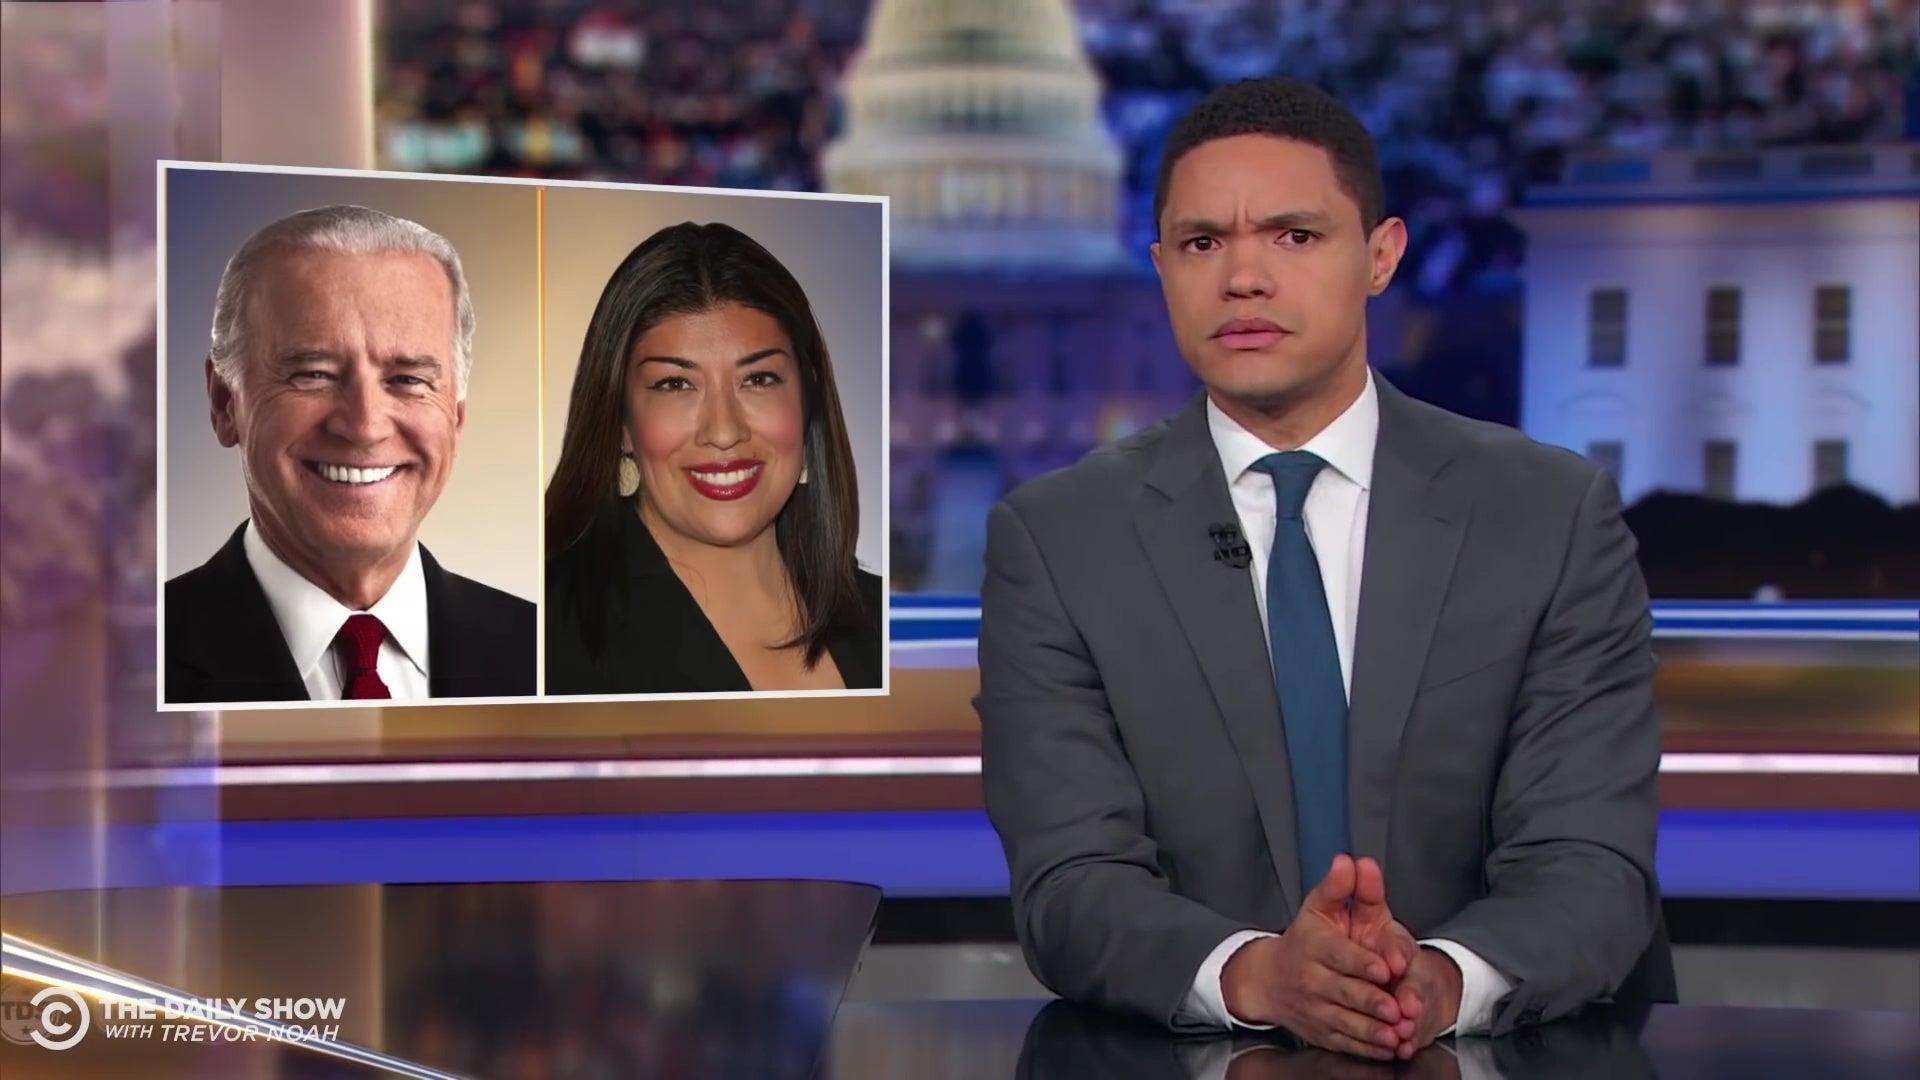 Trevor Noah at an anchorman's desk in front of photos of Joe Biden and Lucy Flores.